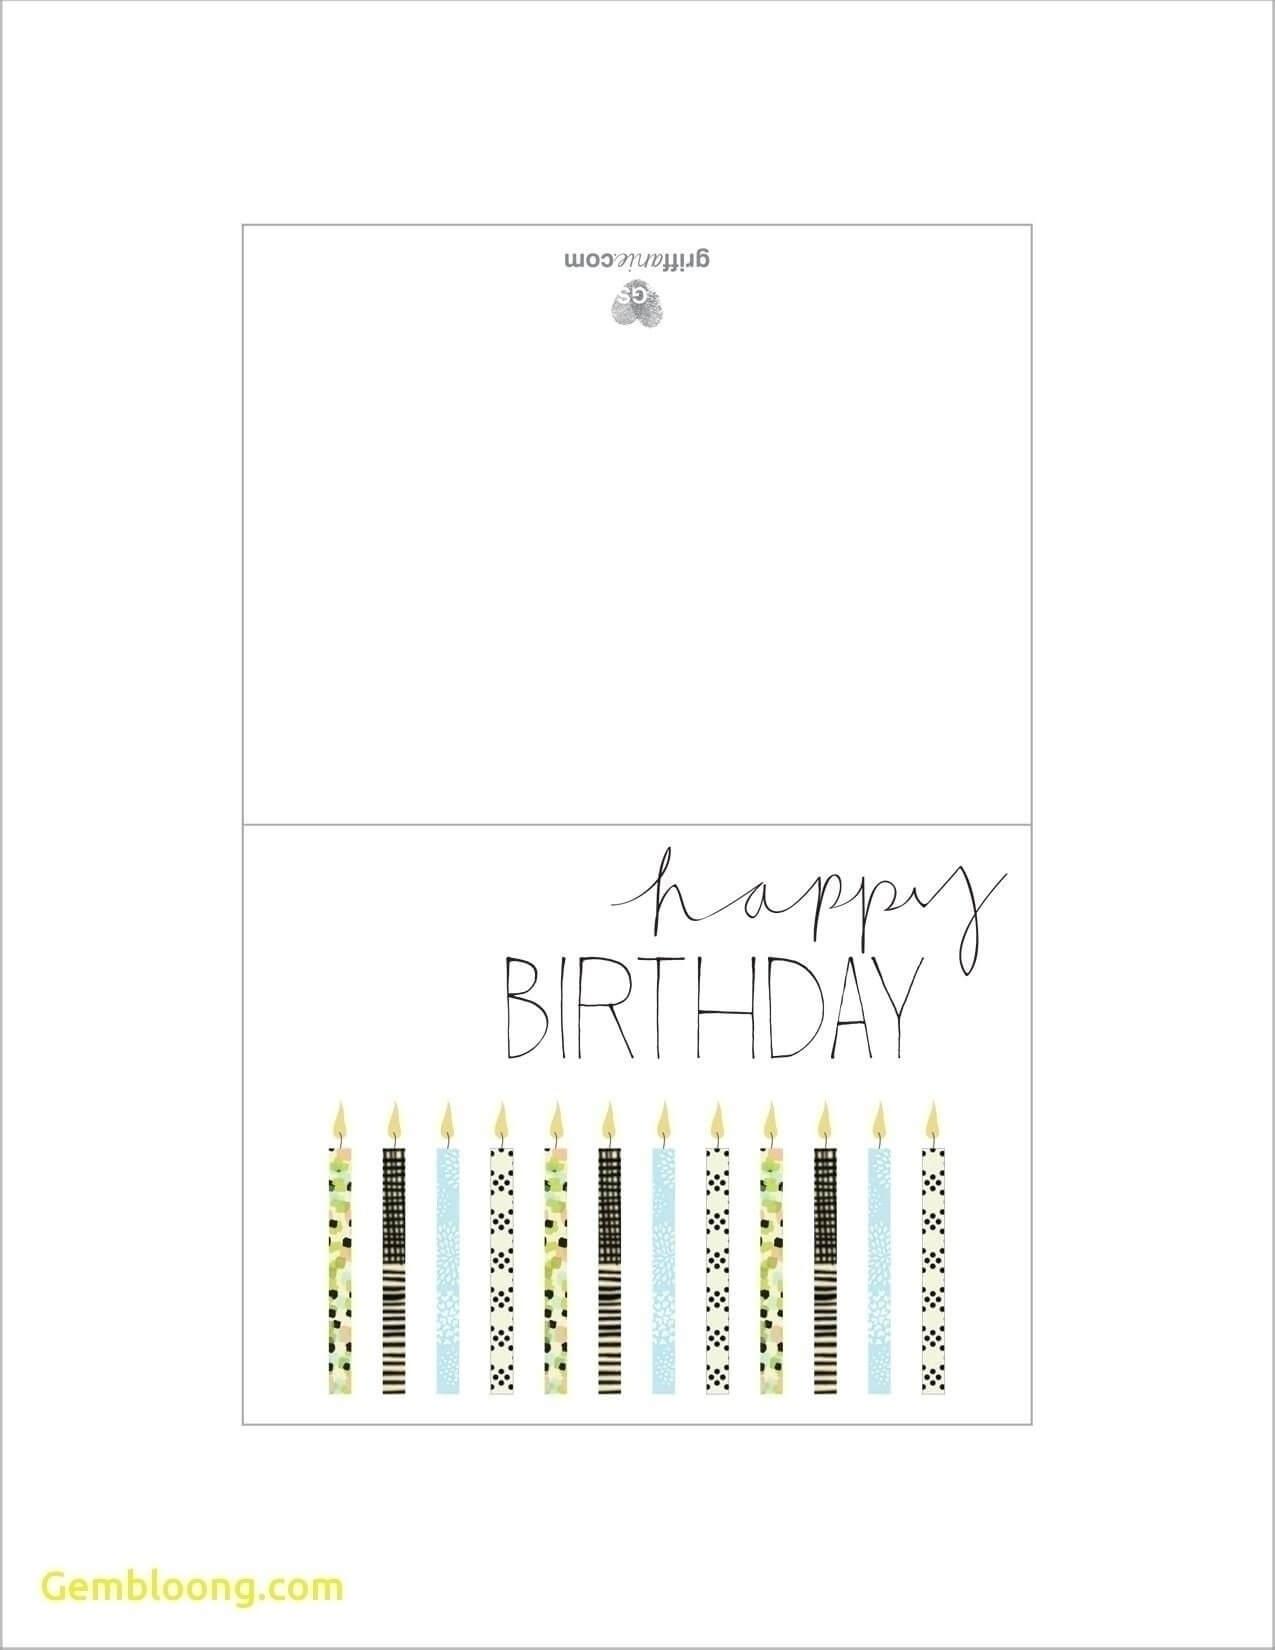 Printable Birthday Cards Foldable For Boys | Chart And For Foldable Birthday Card Template